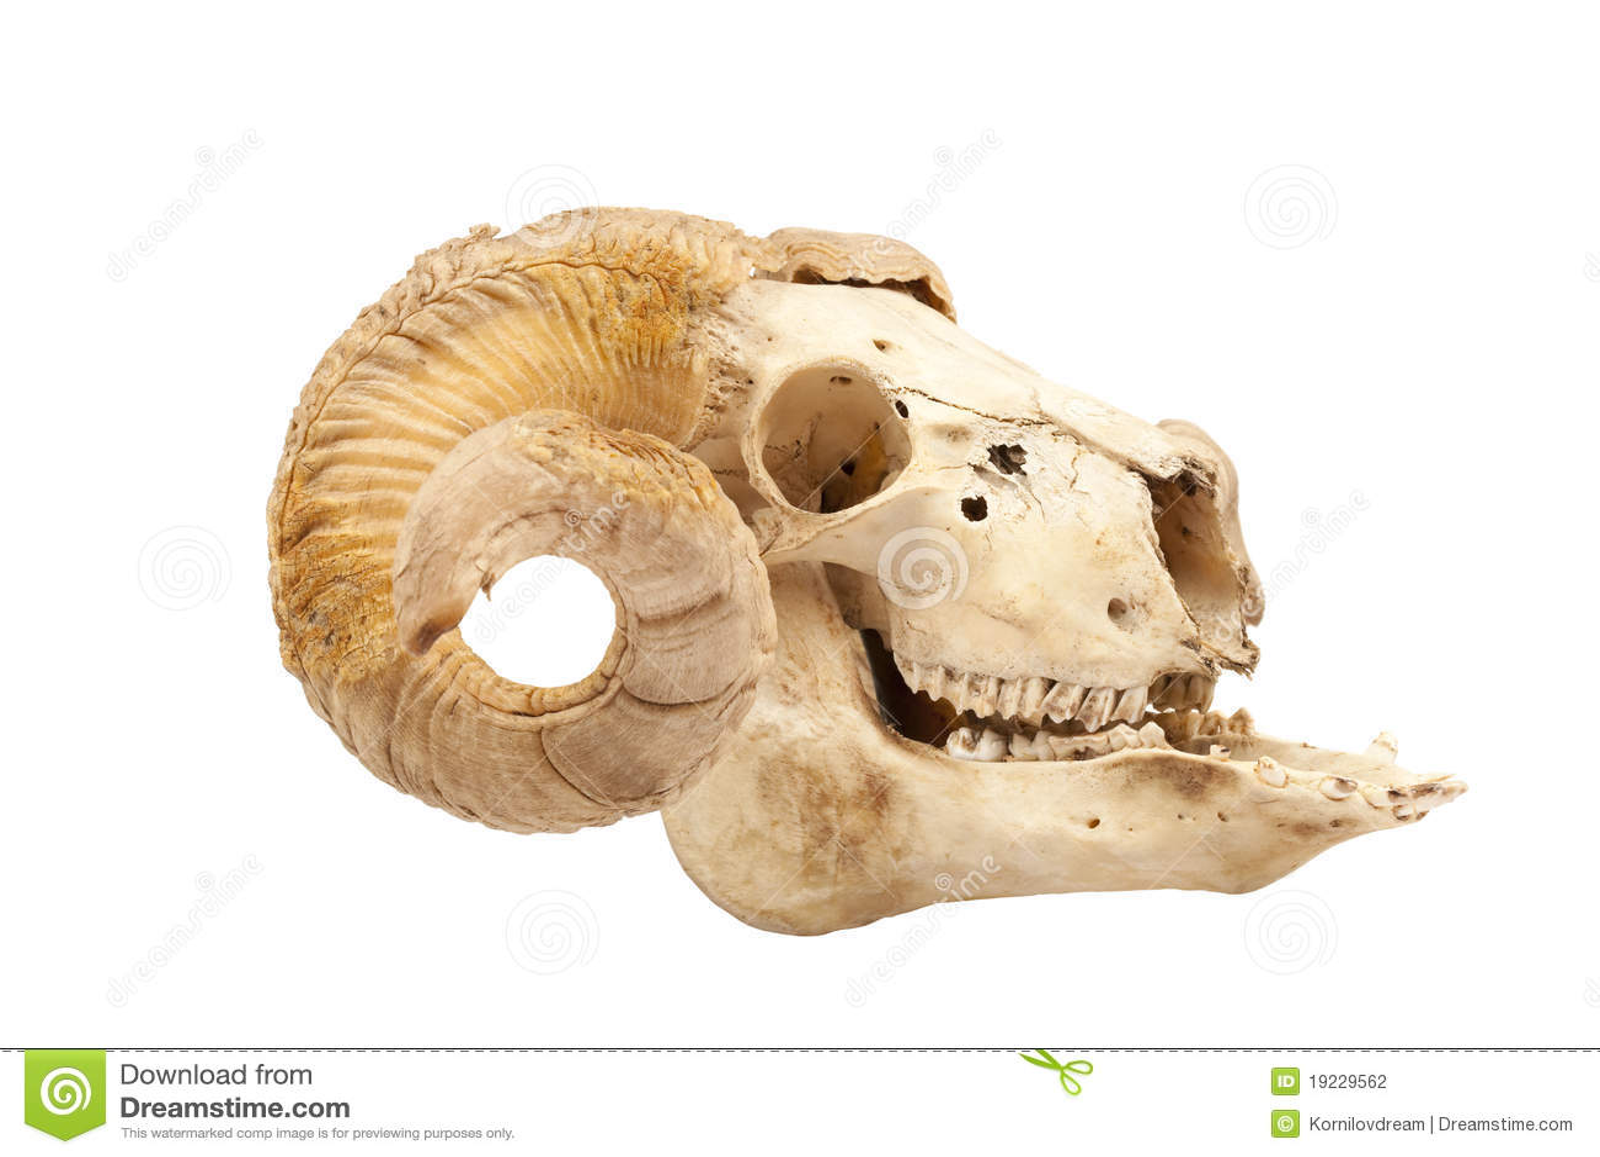 Bighorn Sheep Skull Anatomy Choice Image - human body anatomy